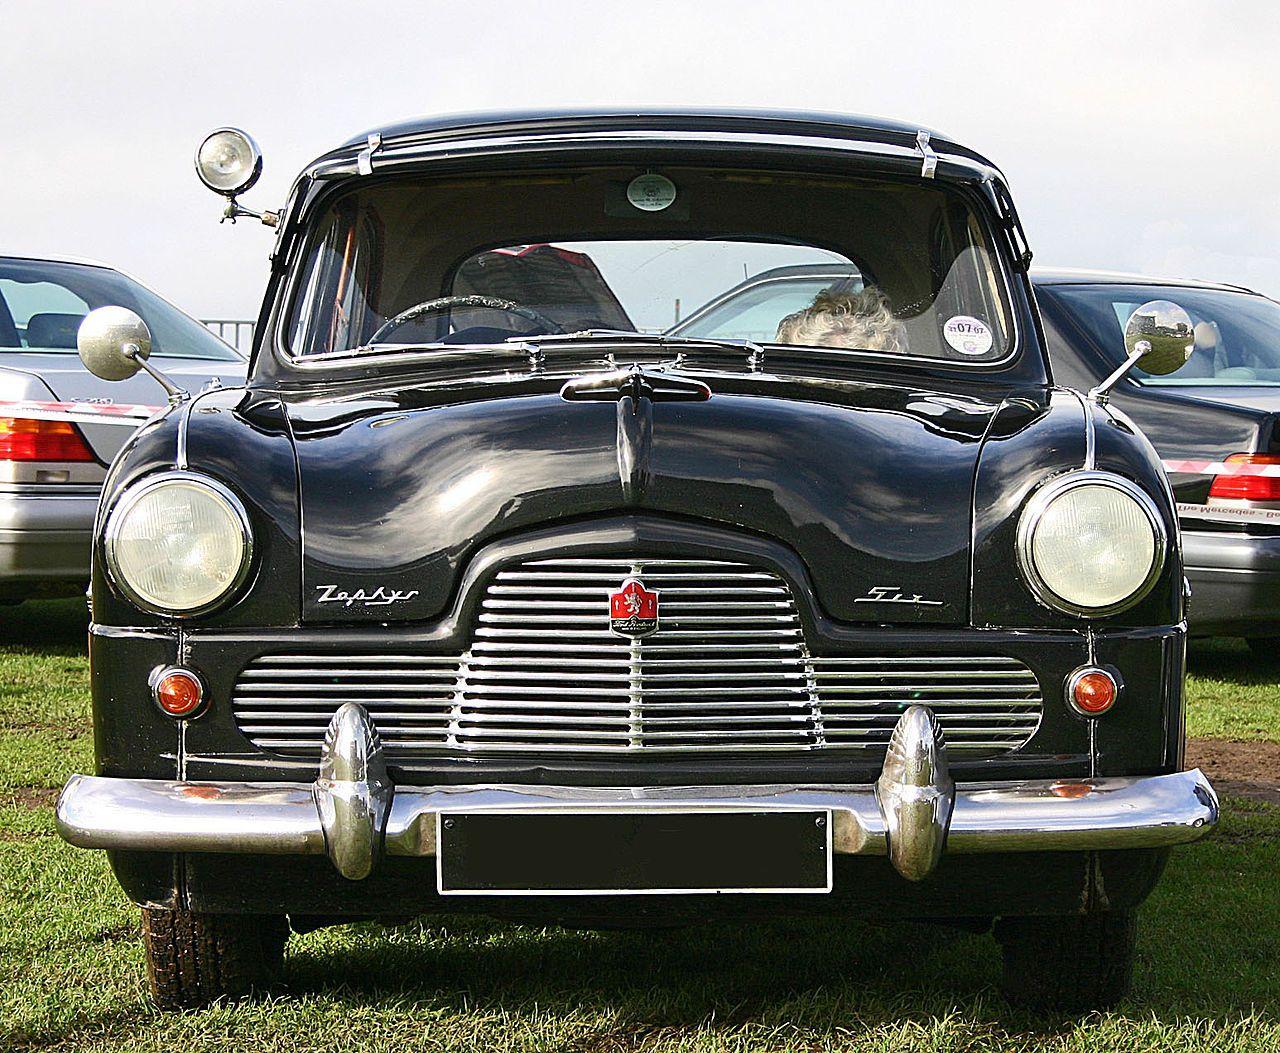 1954 Ford Zephyr Six